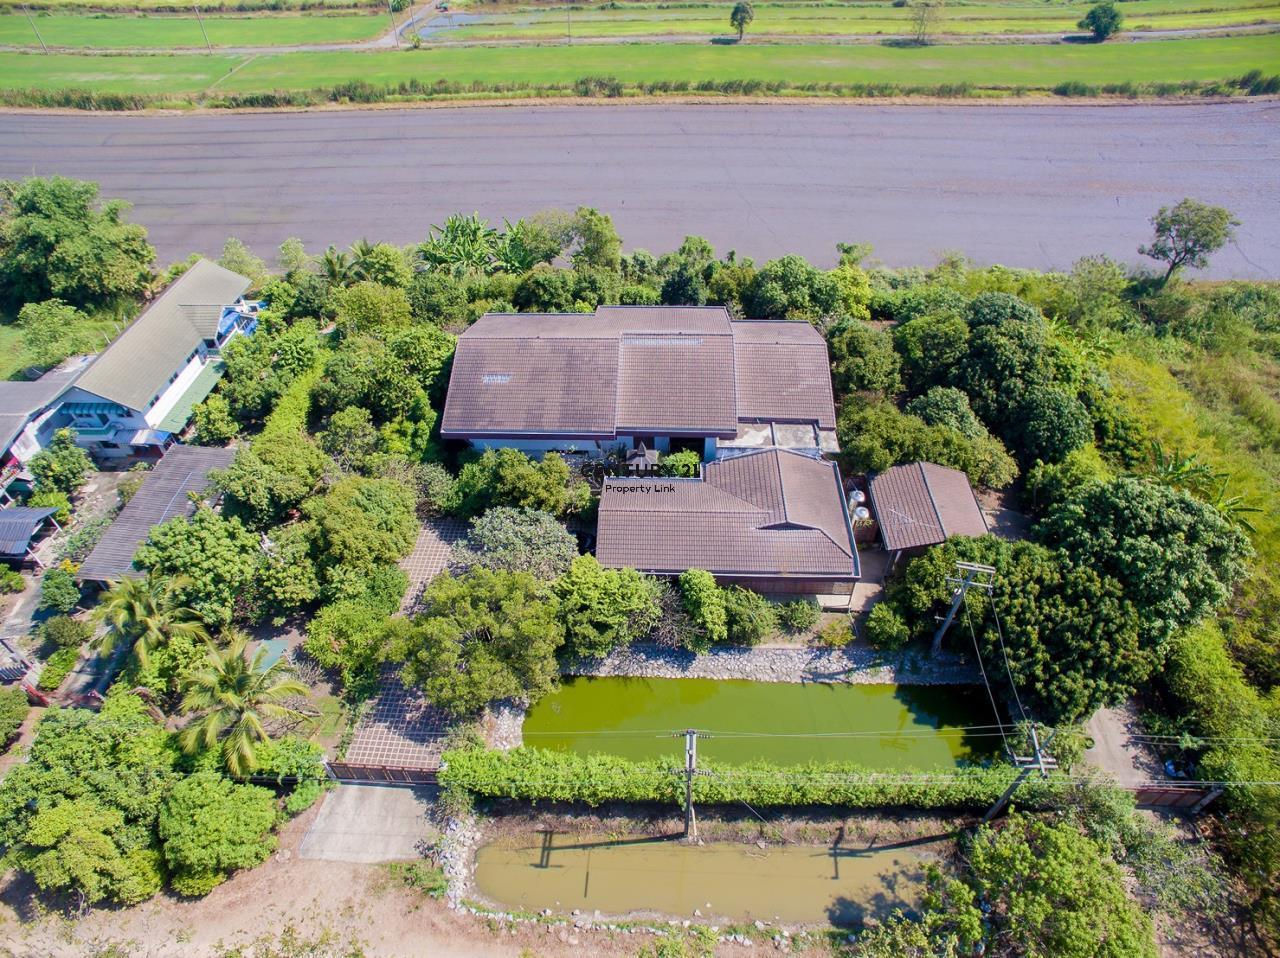 Century21 Property Link Agency's 38-HH-61076 A Big Single House @Khlong Luang Fully Furnished near Wang Noi Market Rajamangala University 1